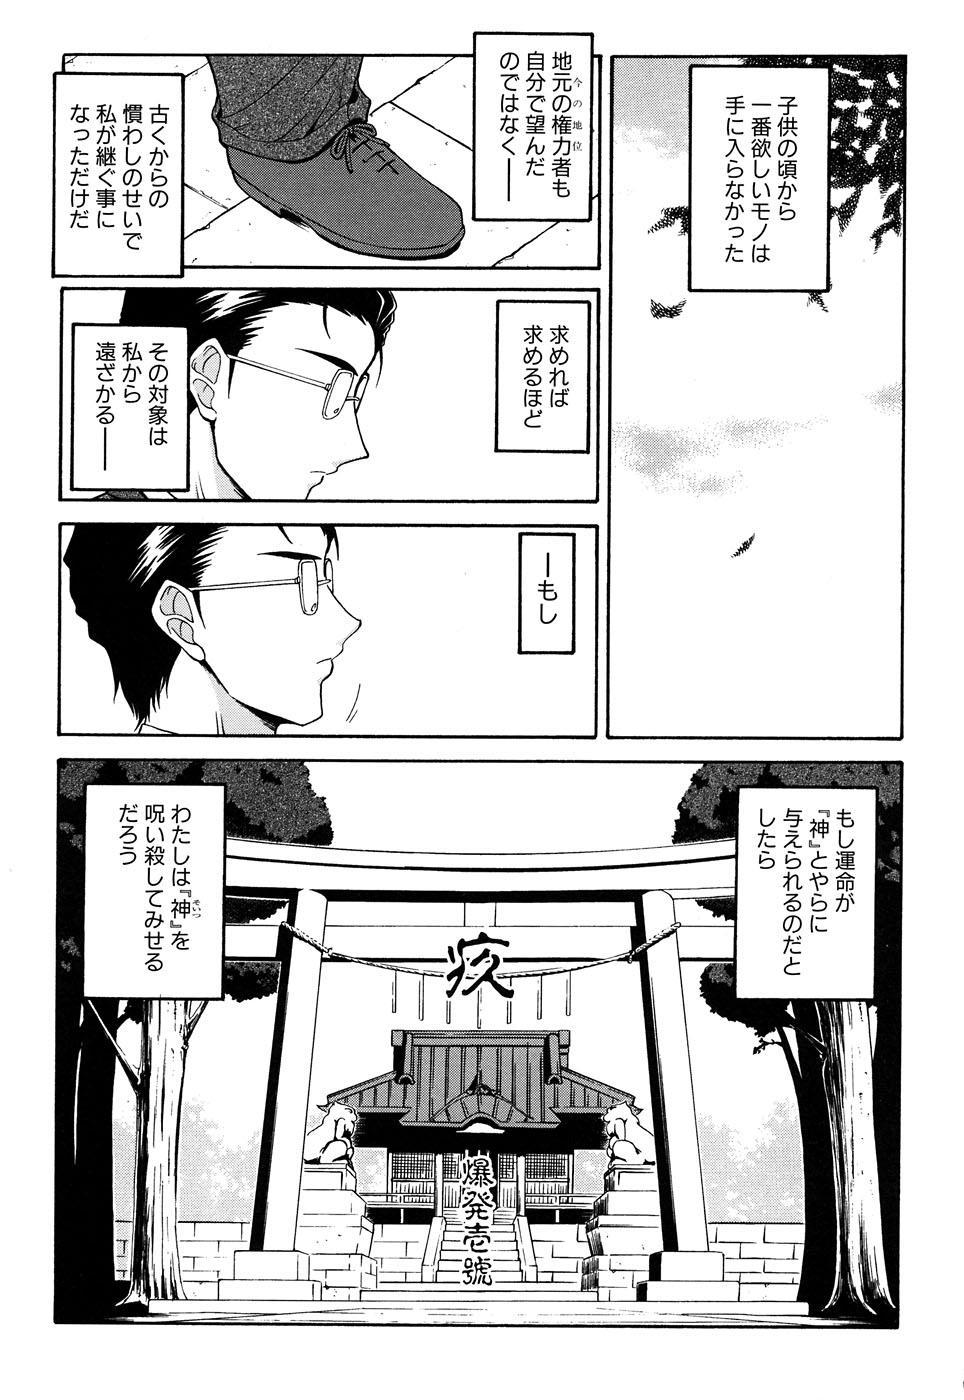 Fechikko VS Series ROUND.2 Miko San VS Maid San 9